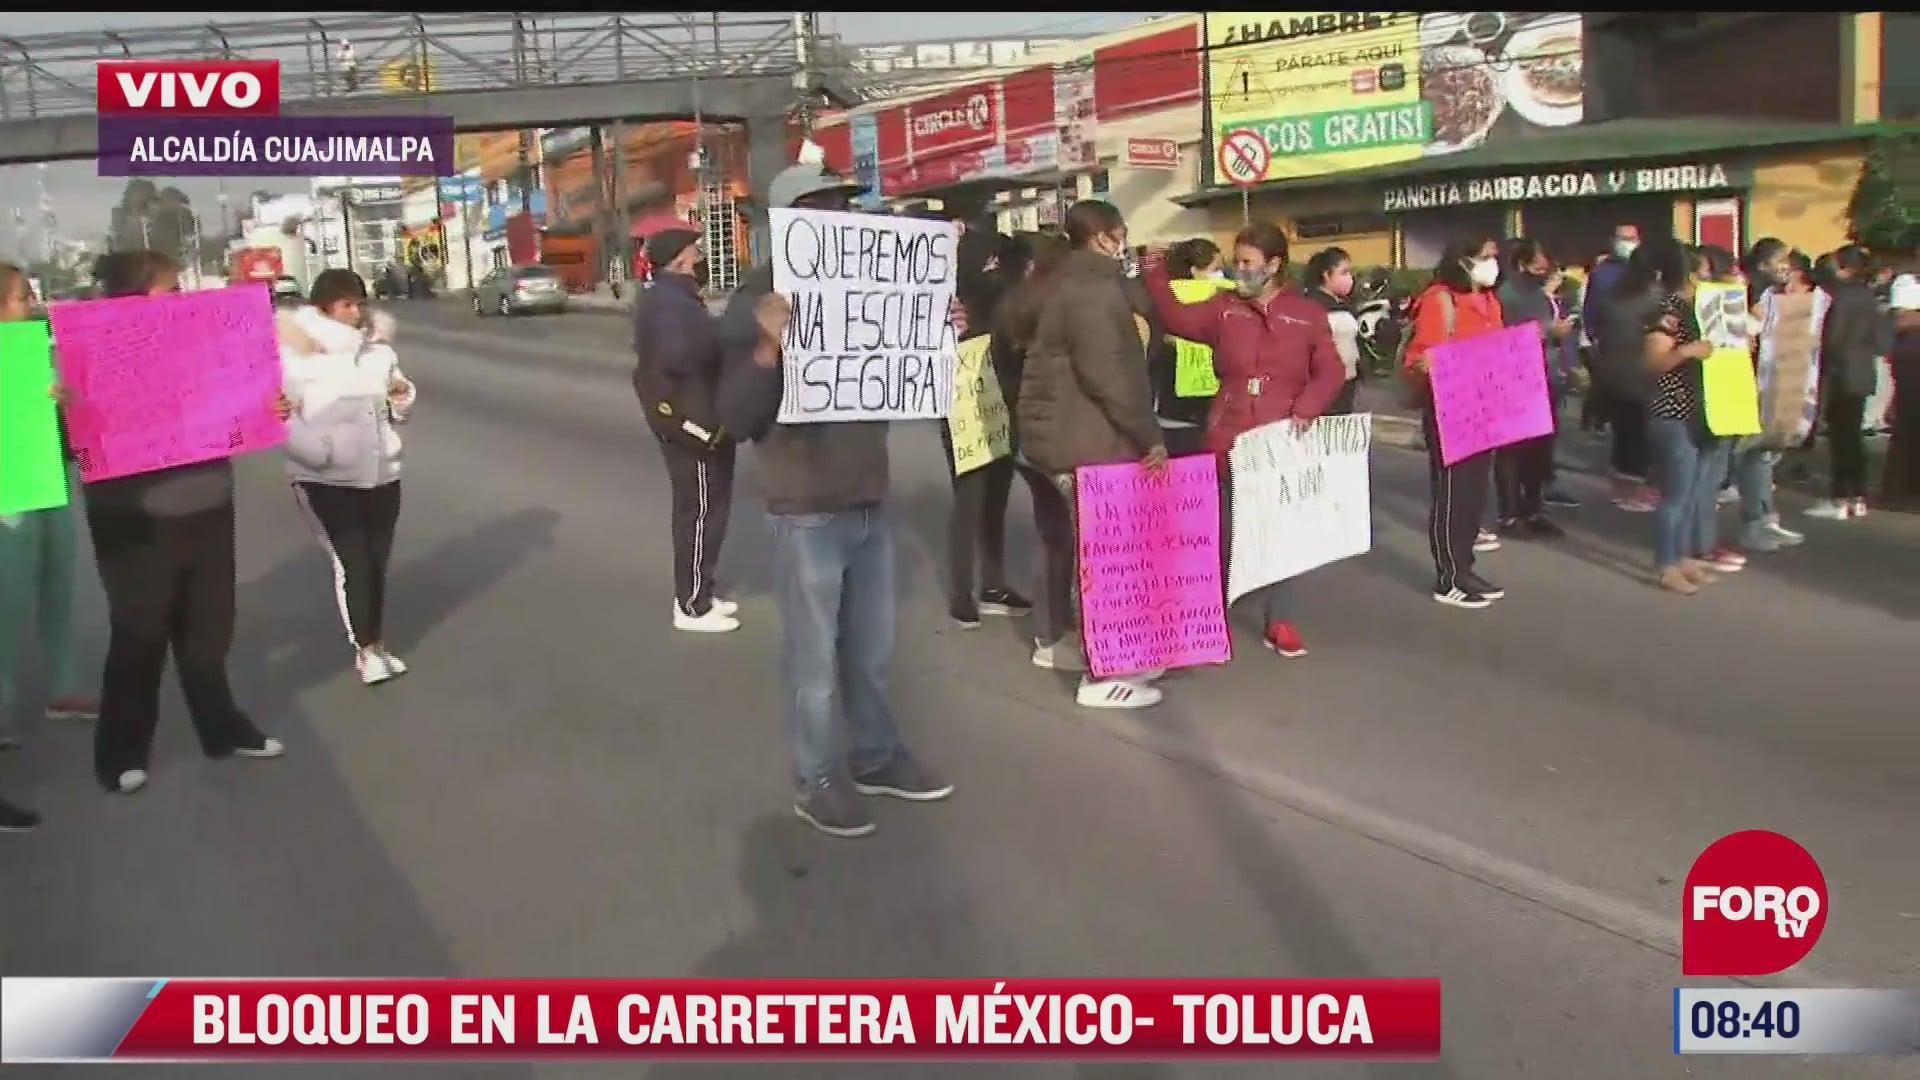 padres de familia bloquean carretera mexico toluca en cuajimalpa